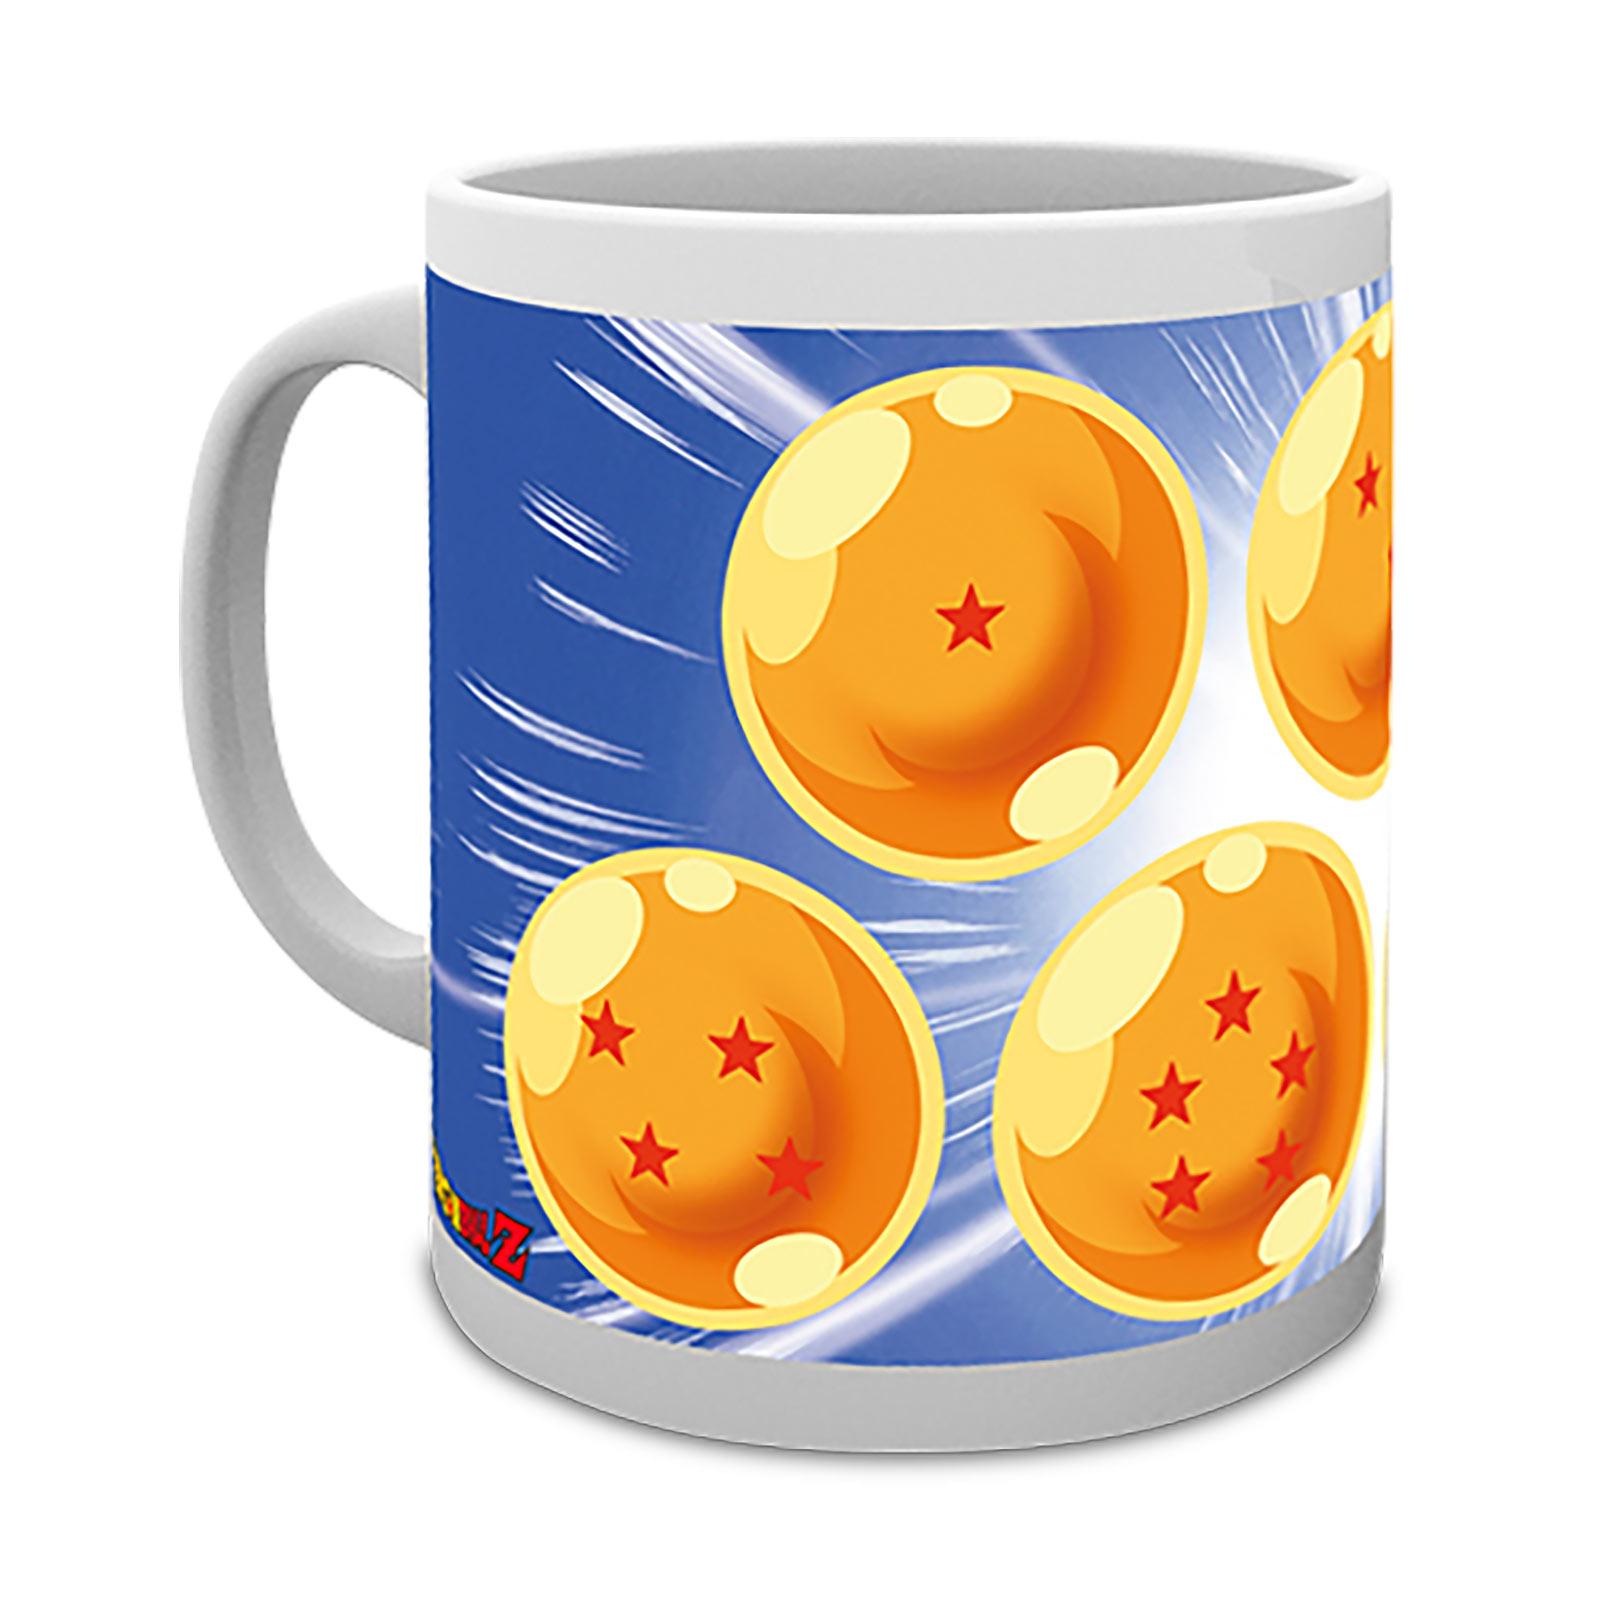 Dragon Ball Z - Dragonballs Tasse